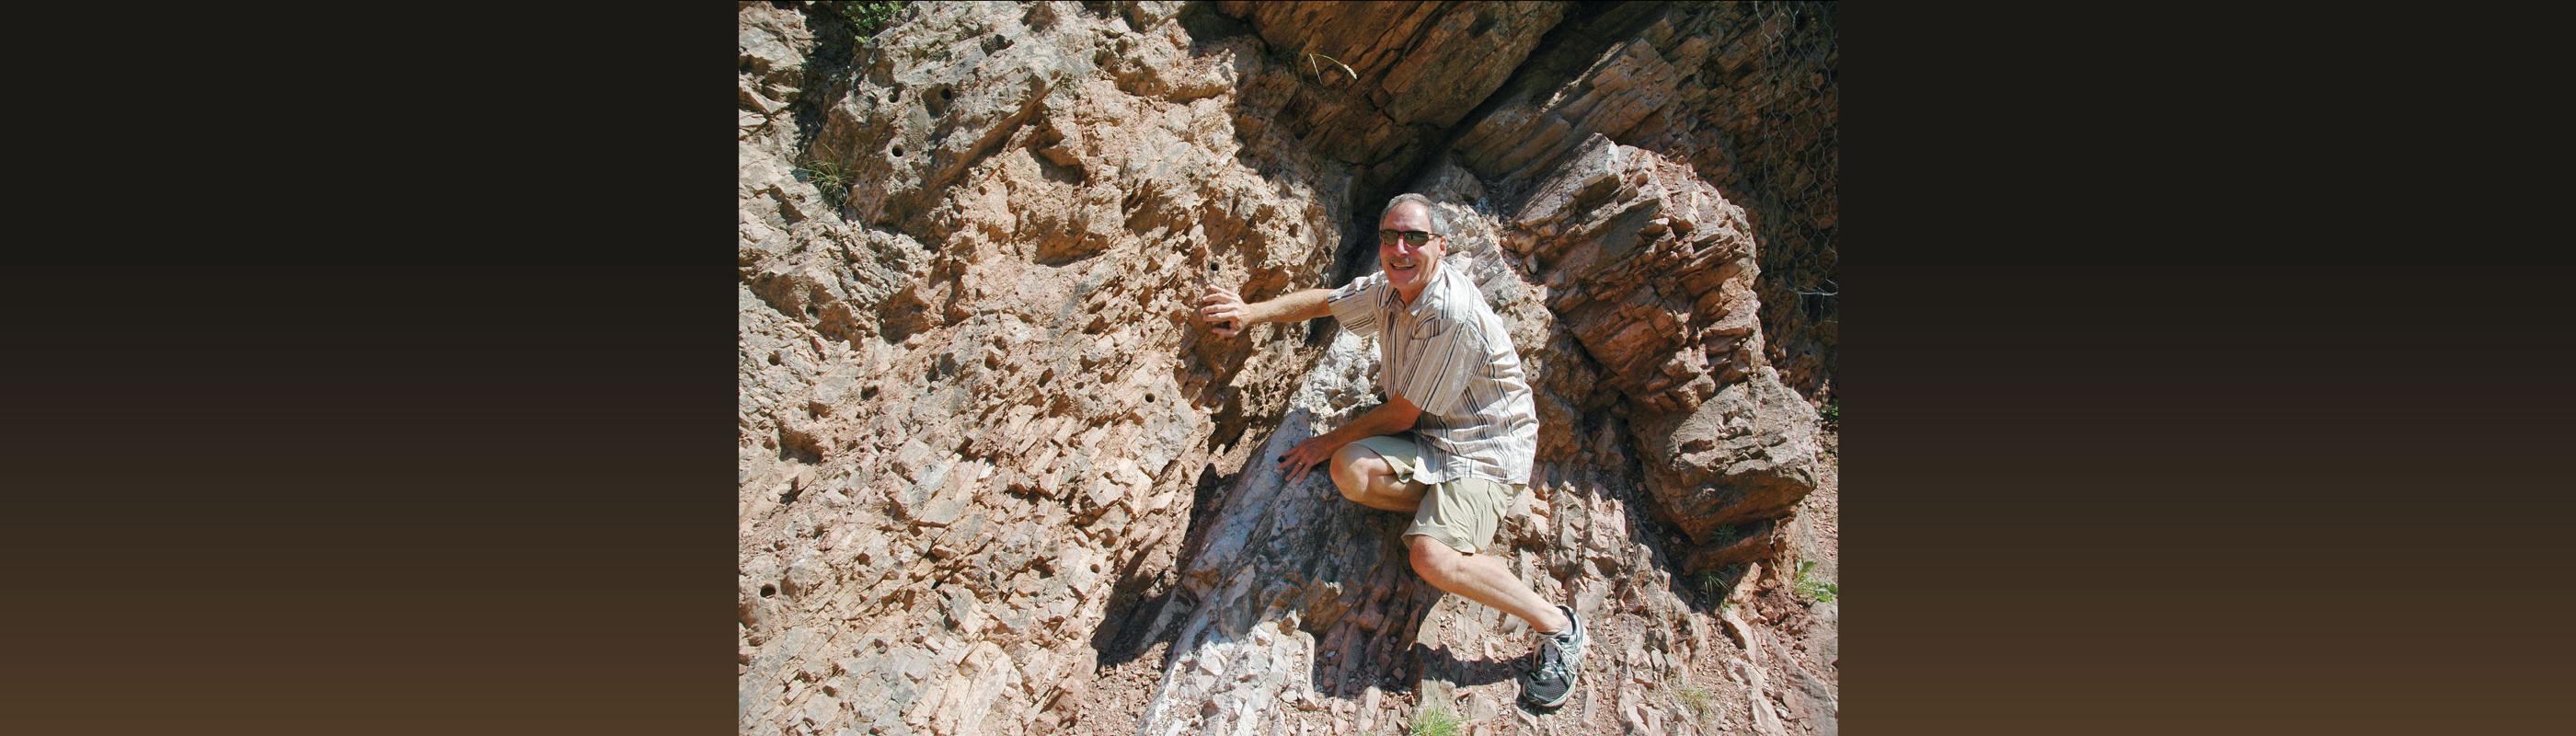 Instructor Mark Bailey on rocks